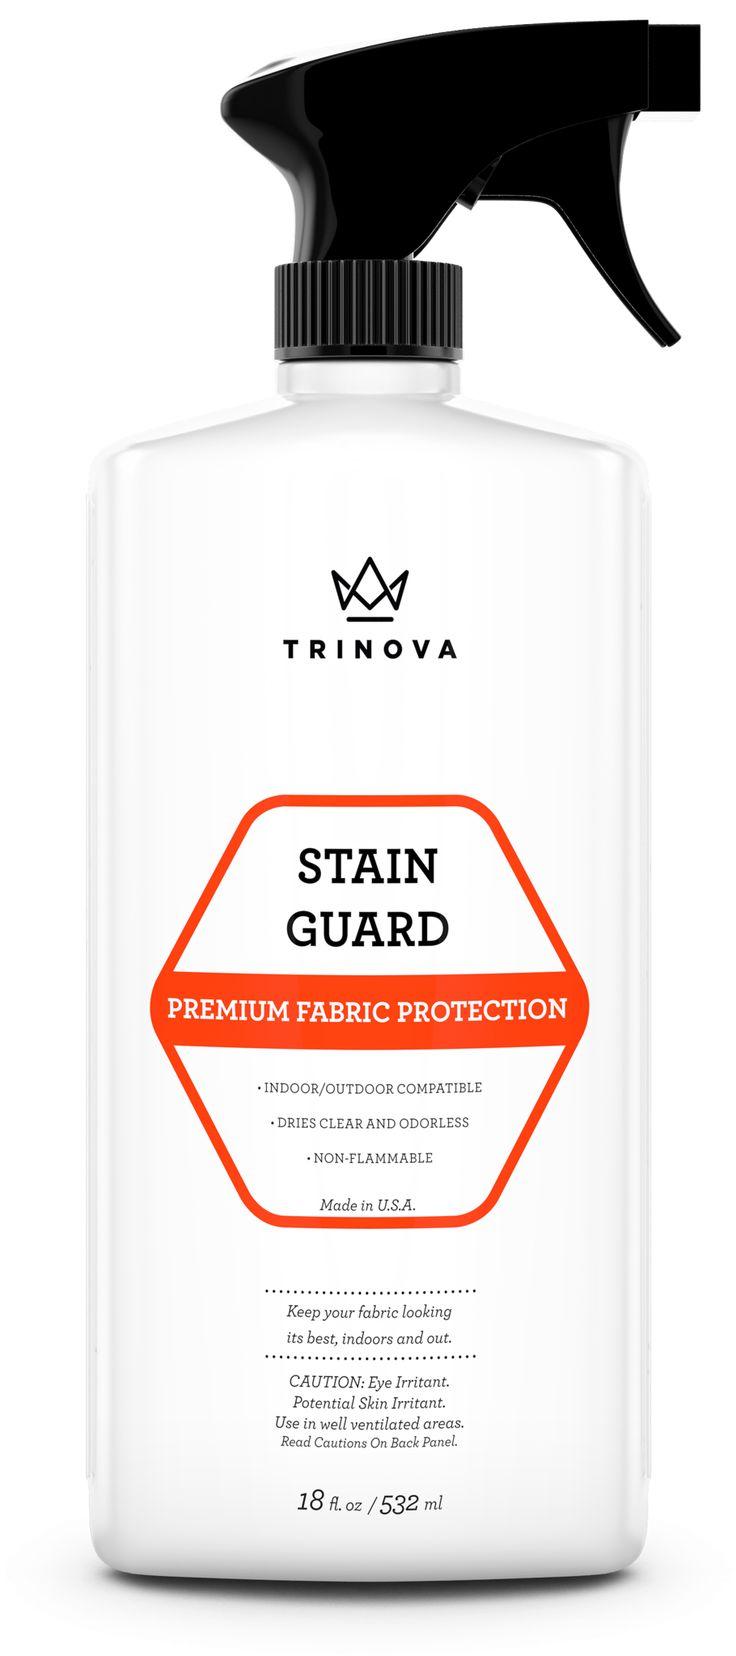 TriNova® Stain Guard Granite cleaner, Granite sealer